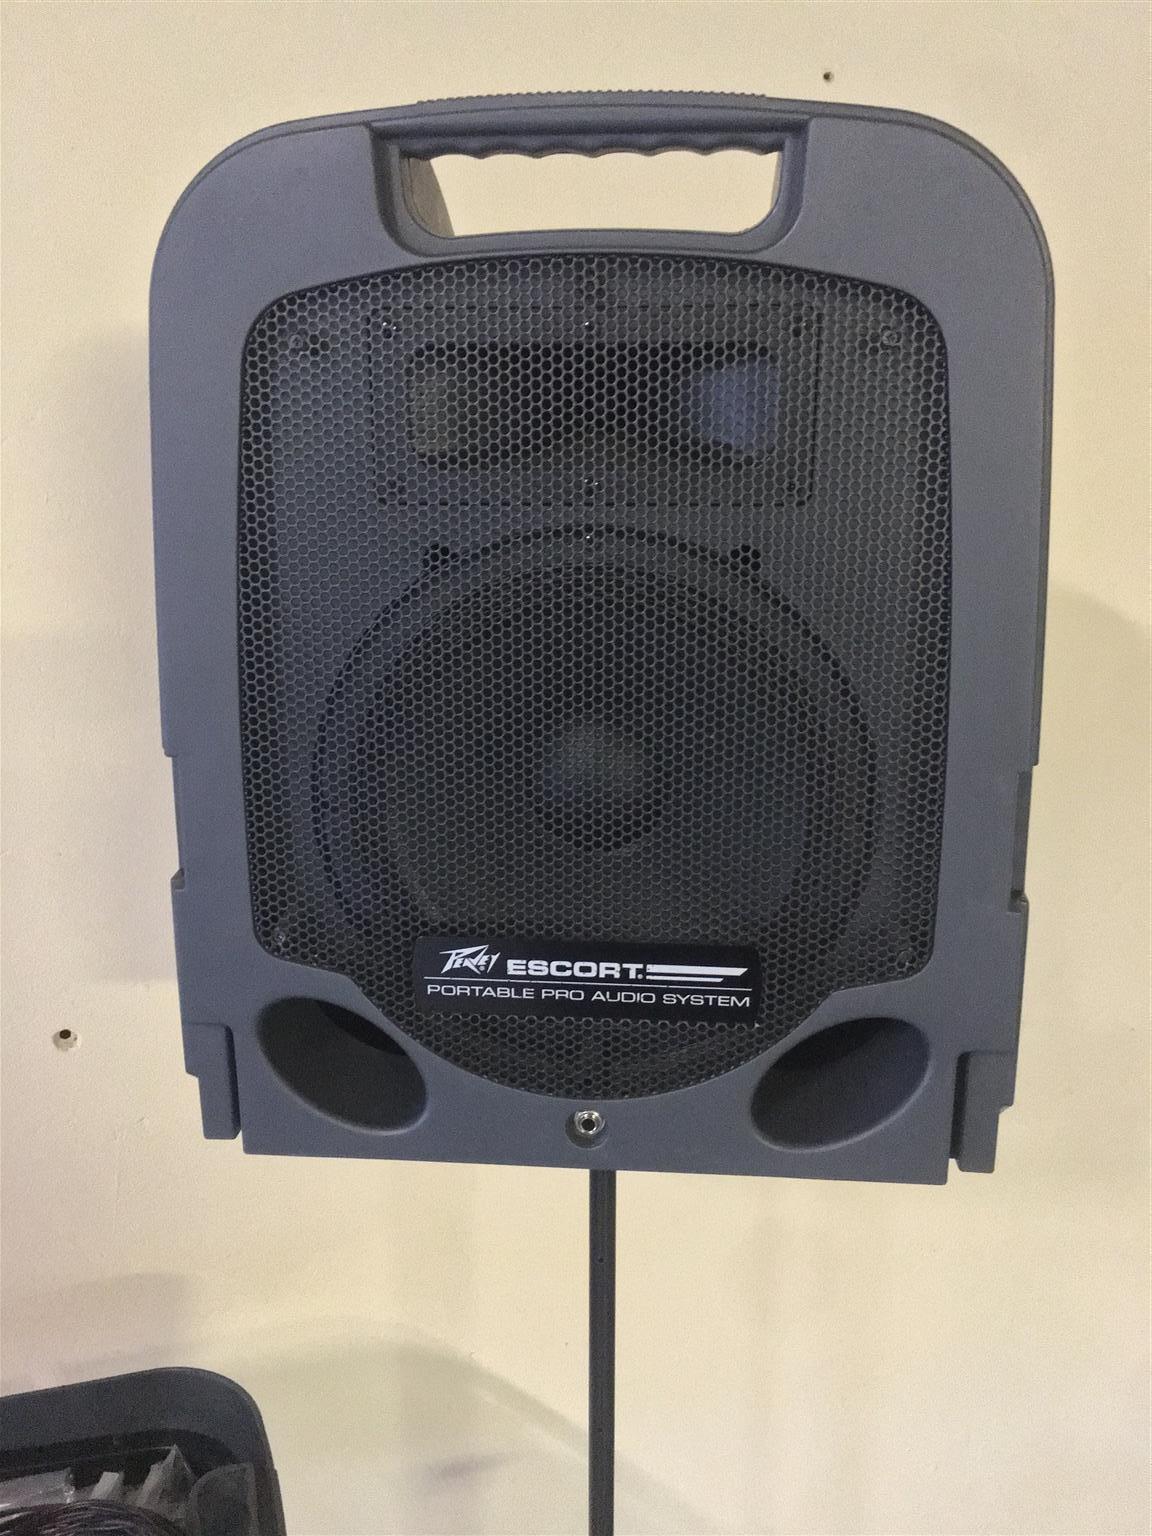 Peavey Escort 3000 portable PA sound system